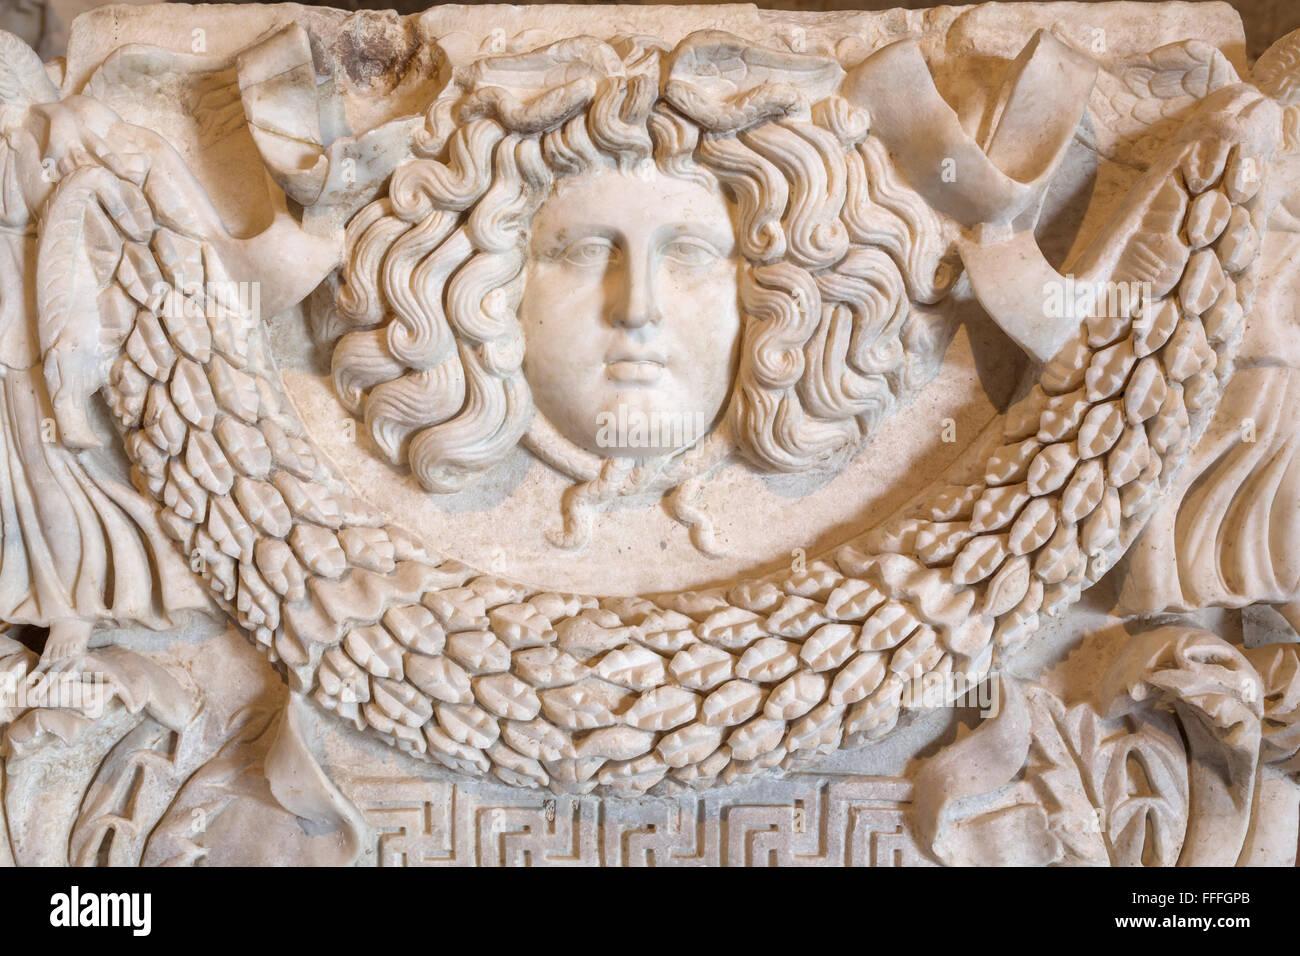 Hellenistic sculpture in archaeology museum, Pamukkale, Hierapolis, Denizli Province, Turkey - Stock Image